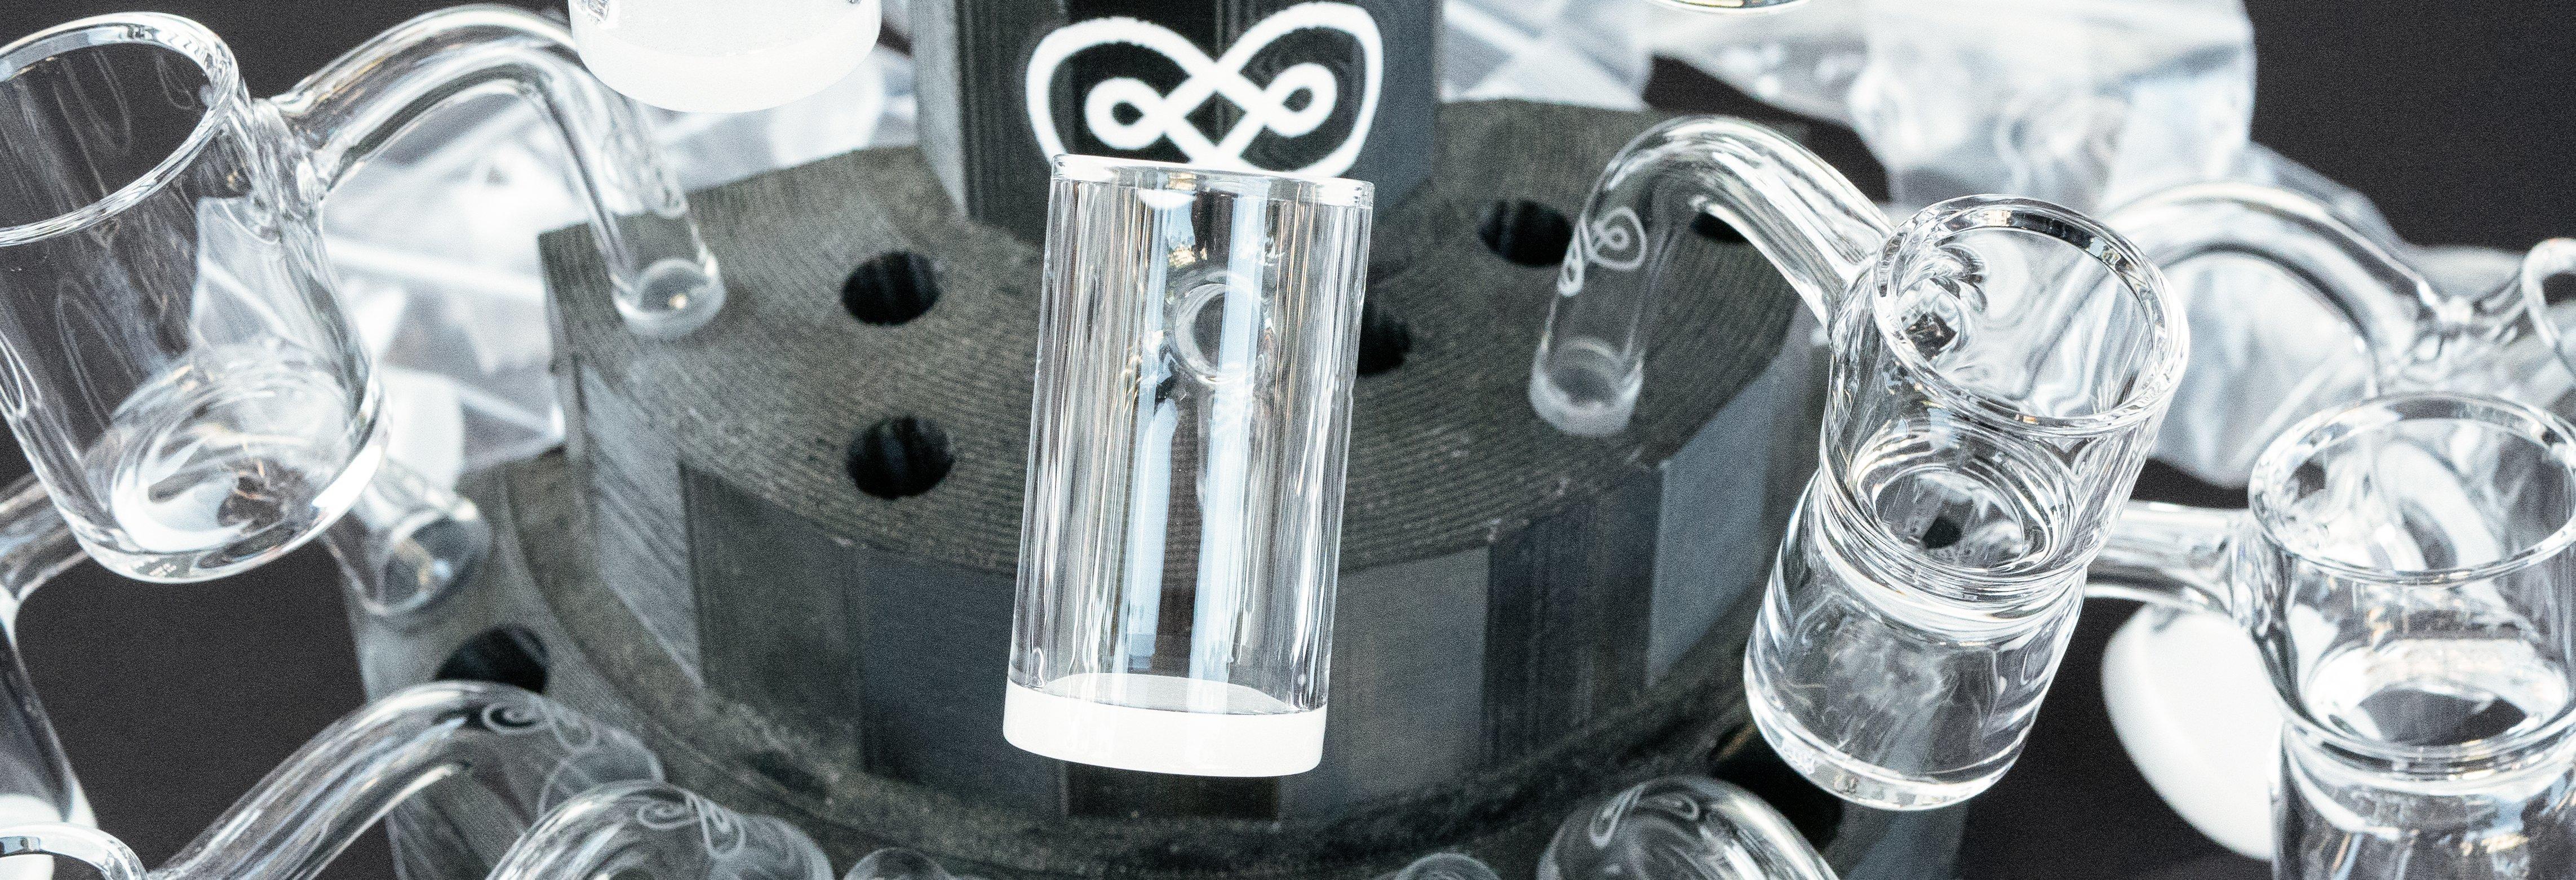 Clear glass pieces by eternal quartz glass